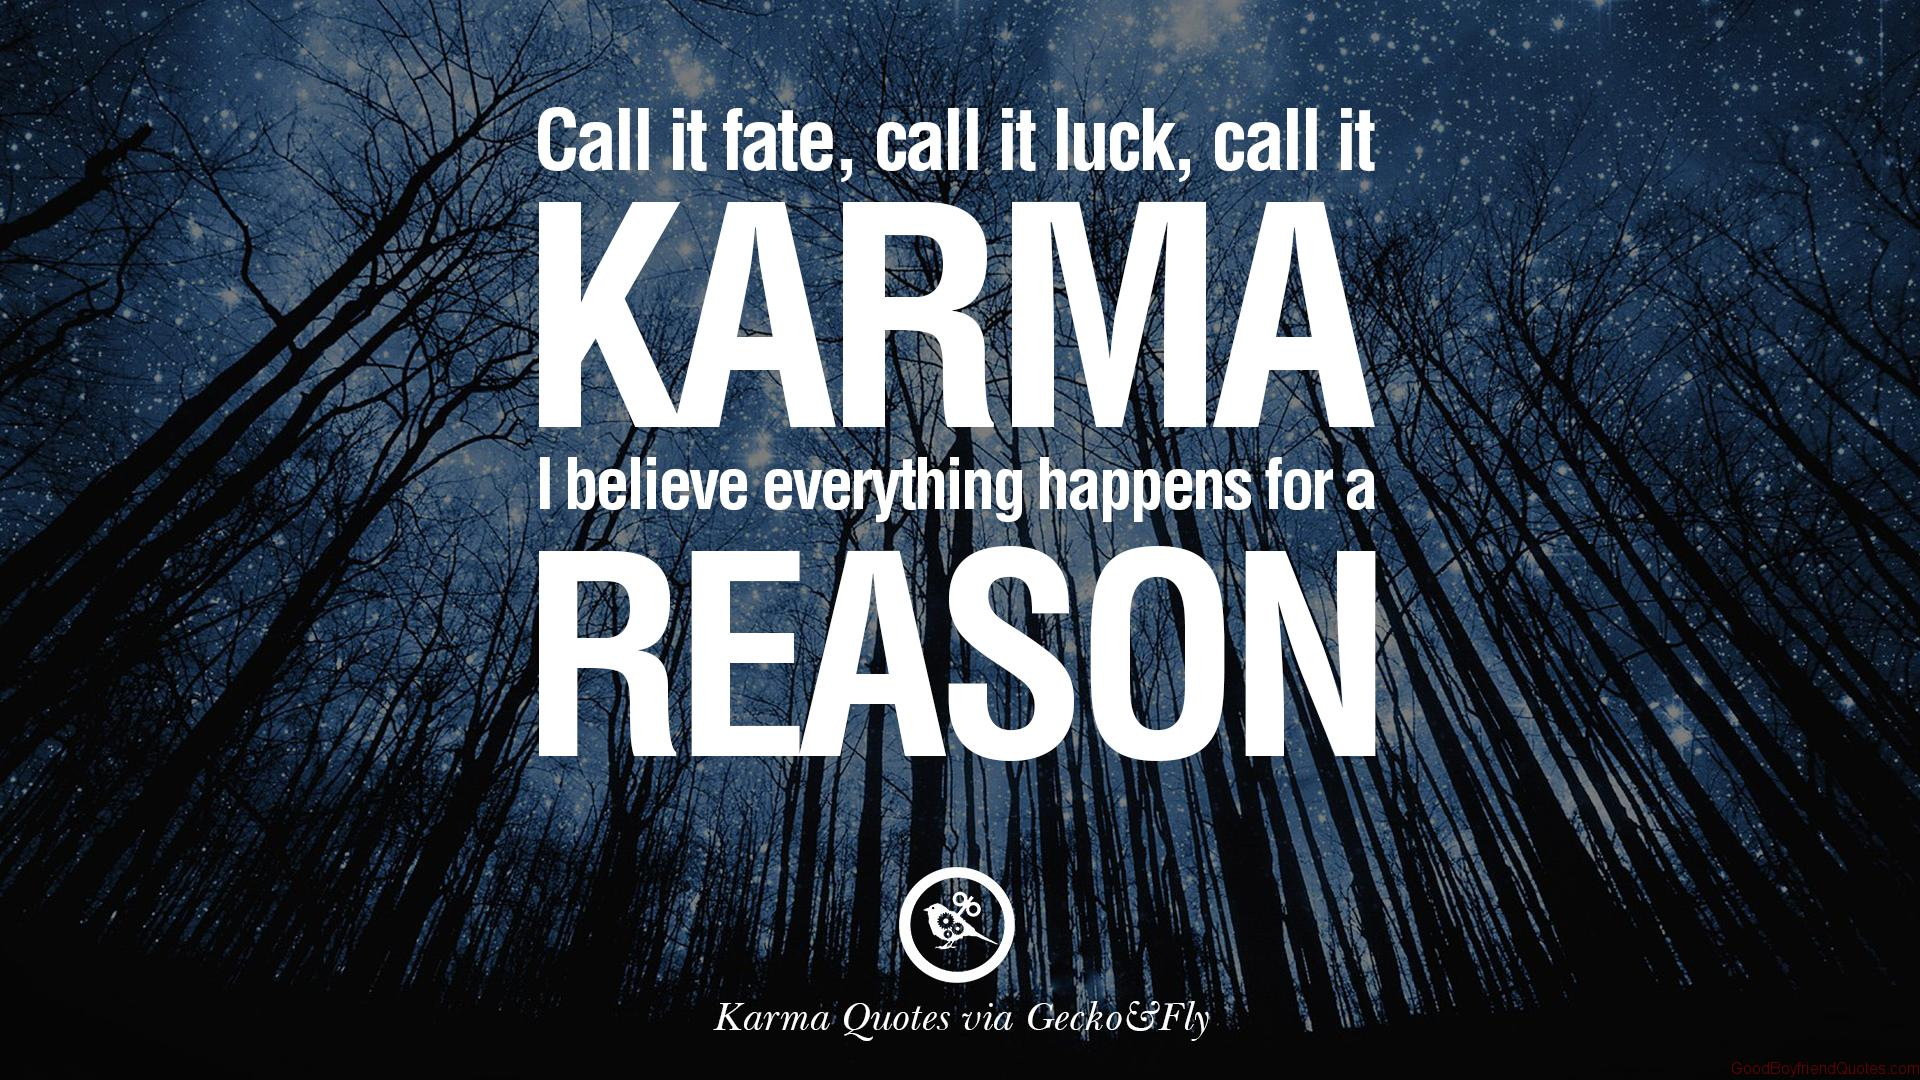 I do not believe in revenge, but I believe in karma